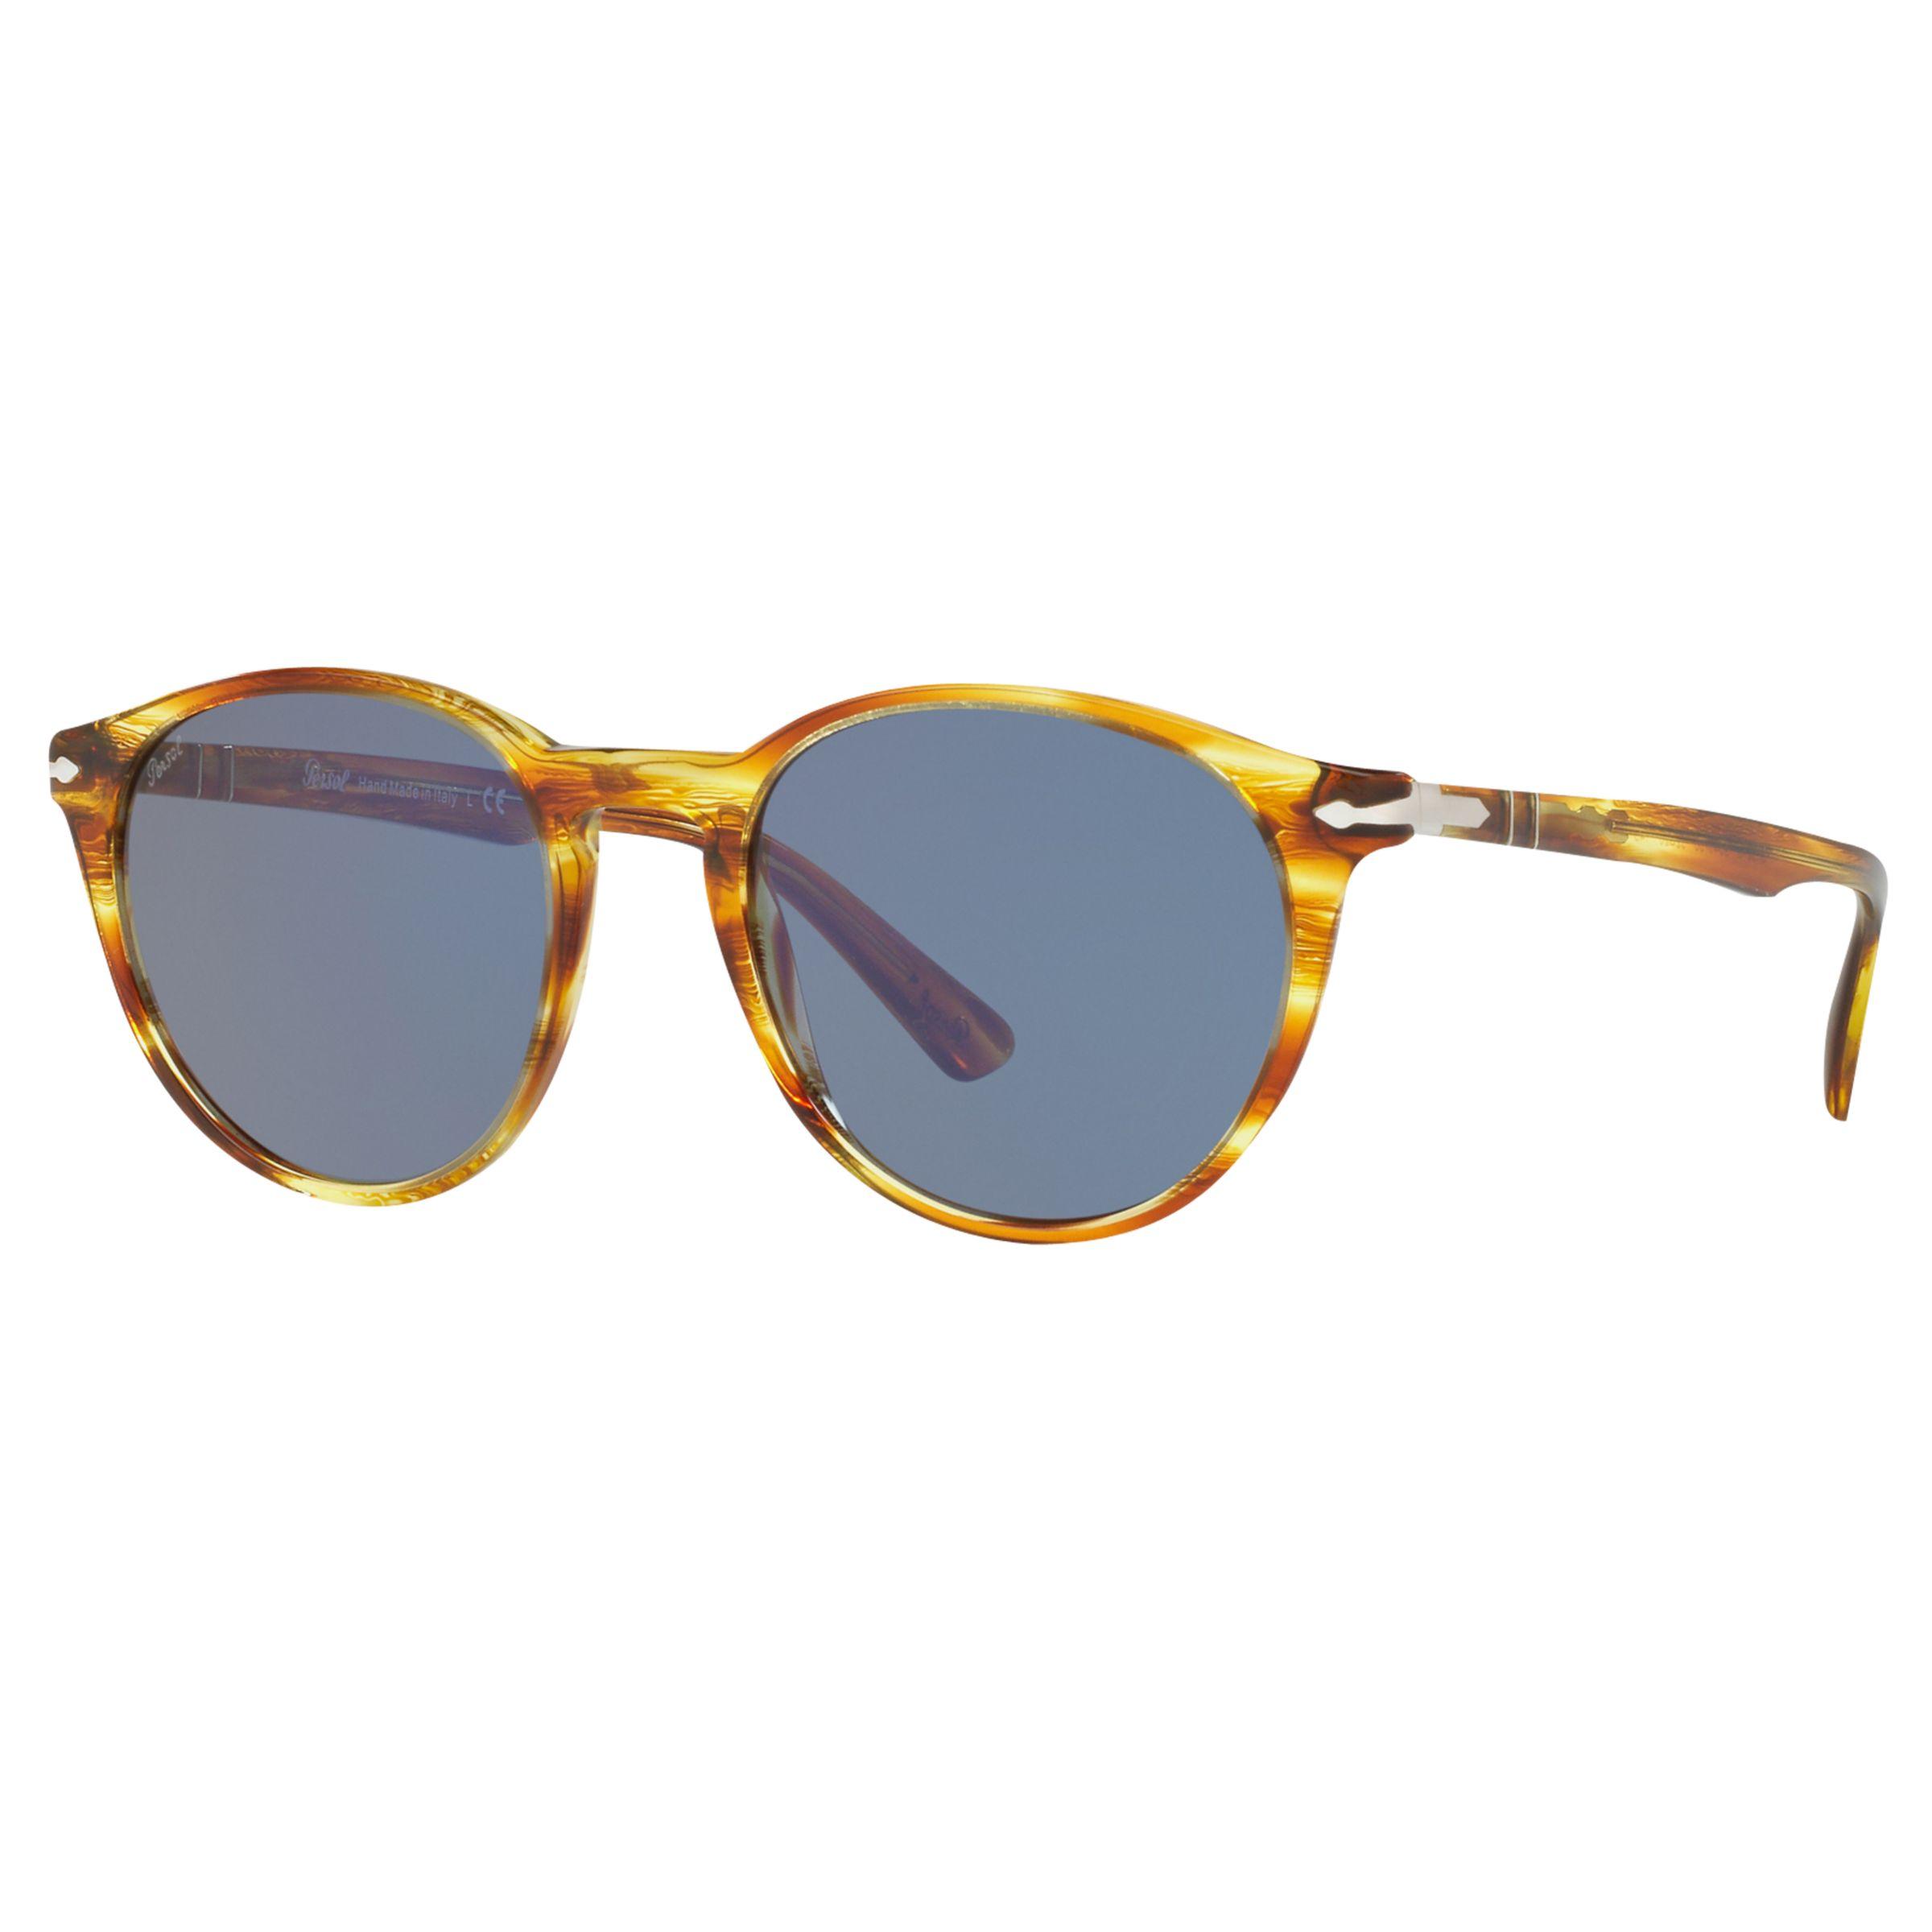 Persol Persol PO3152S Oval Sunglasses, Light Havana/Blue